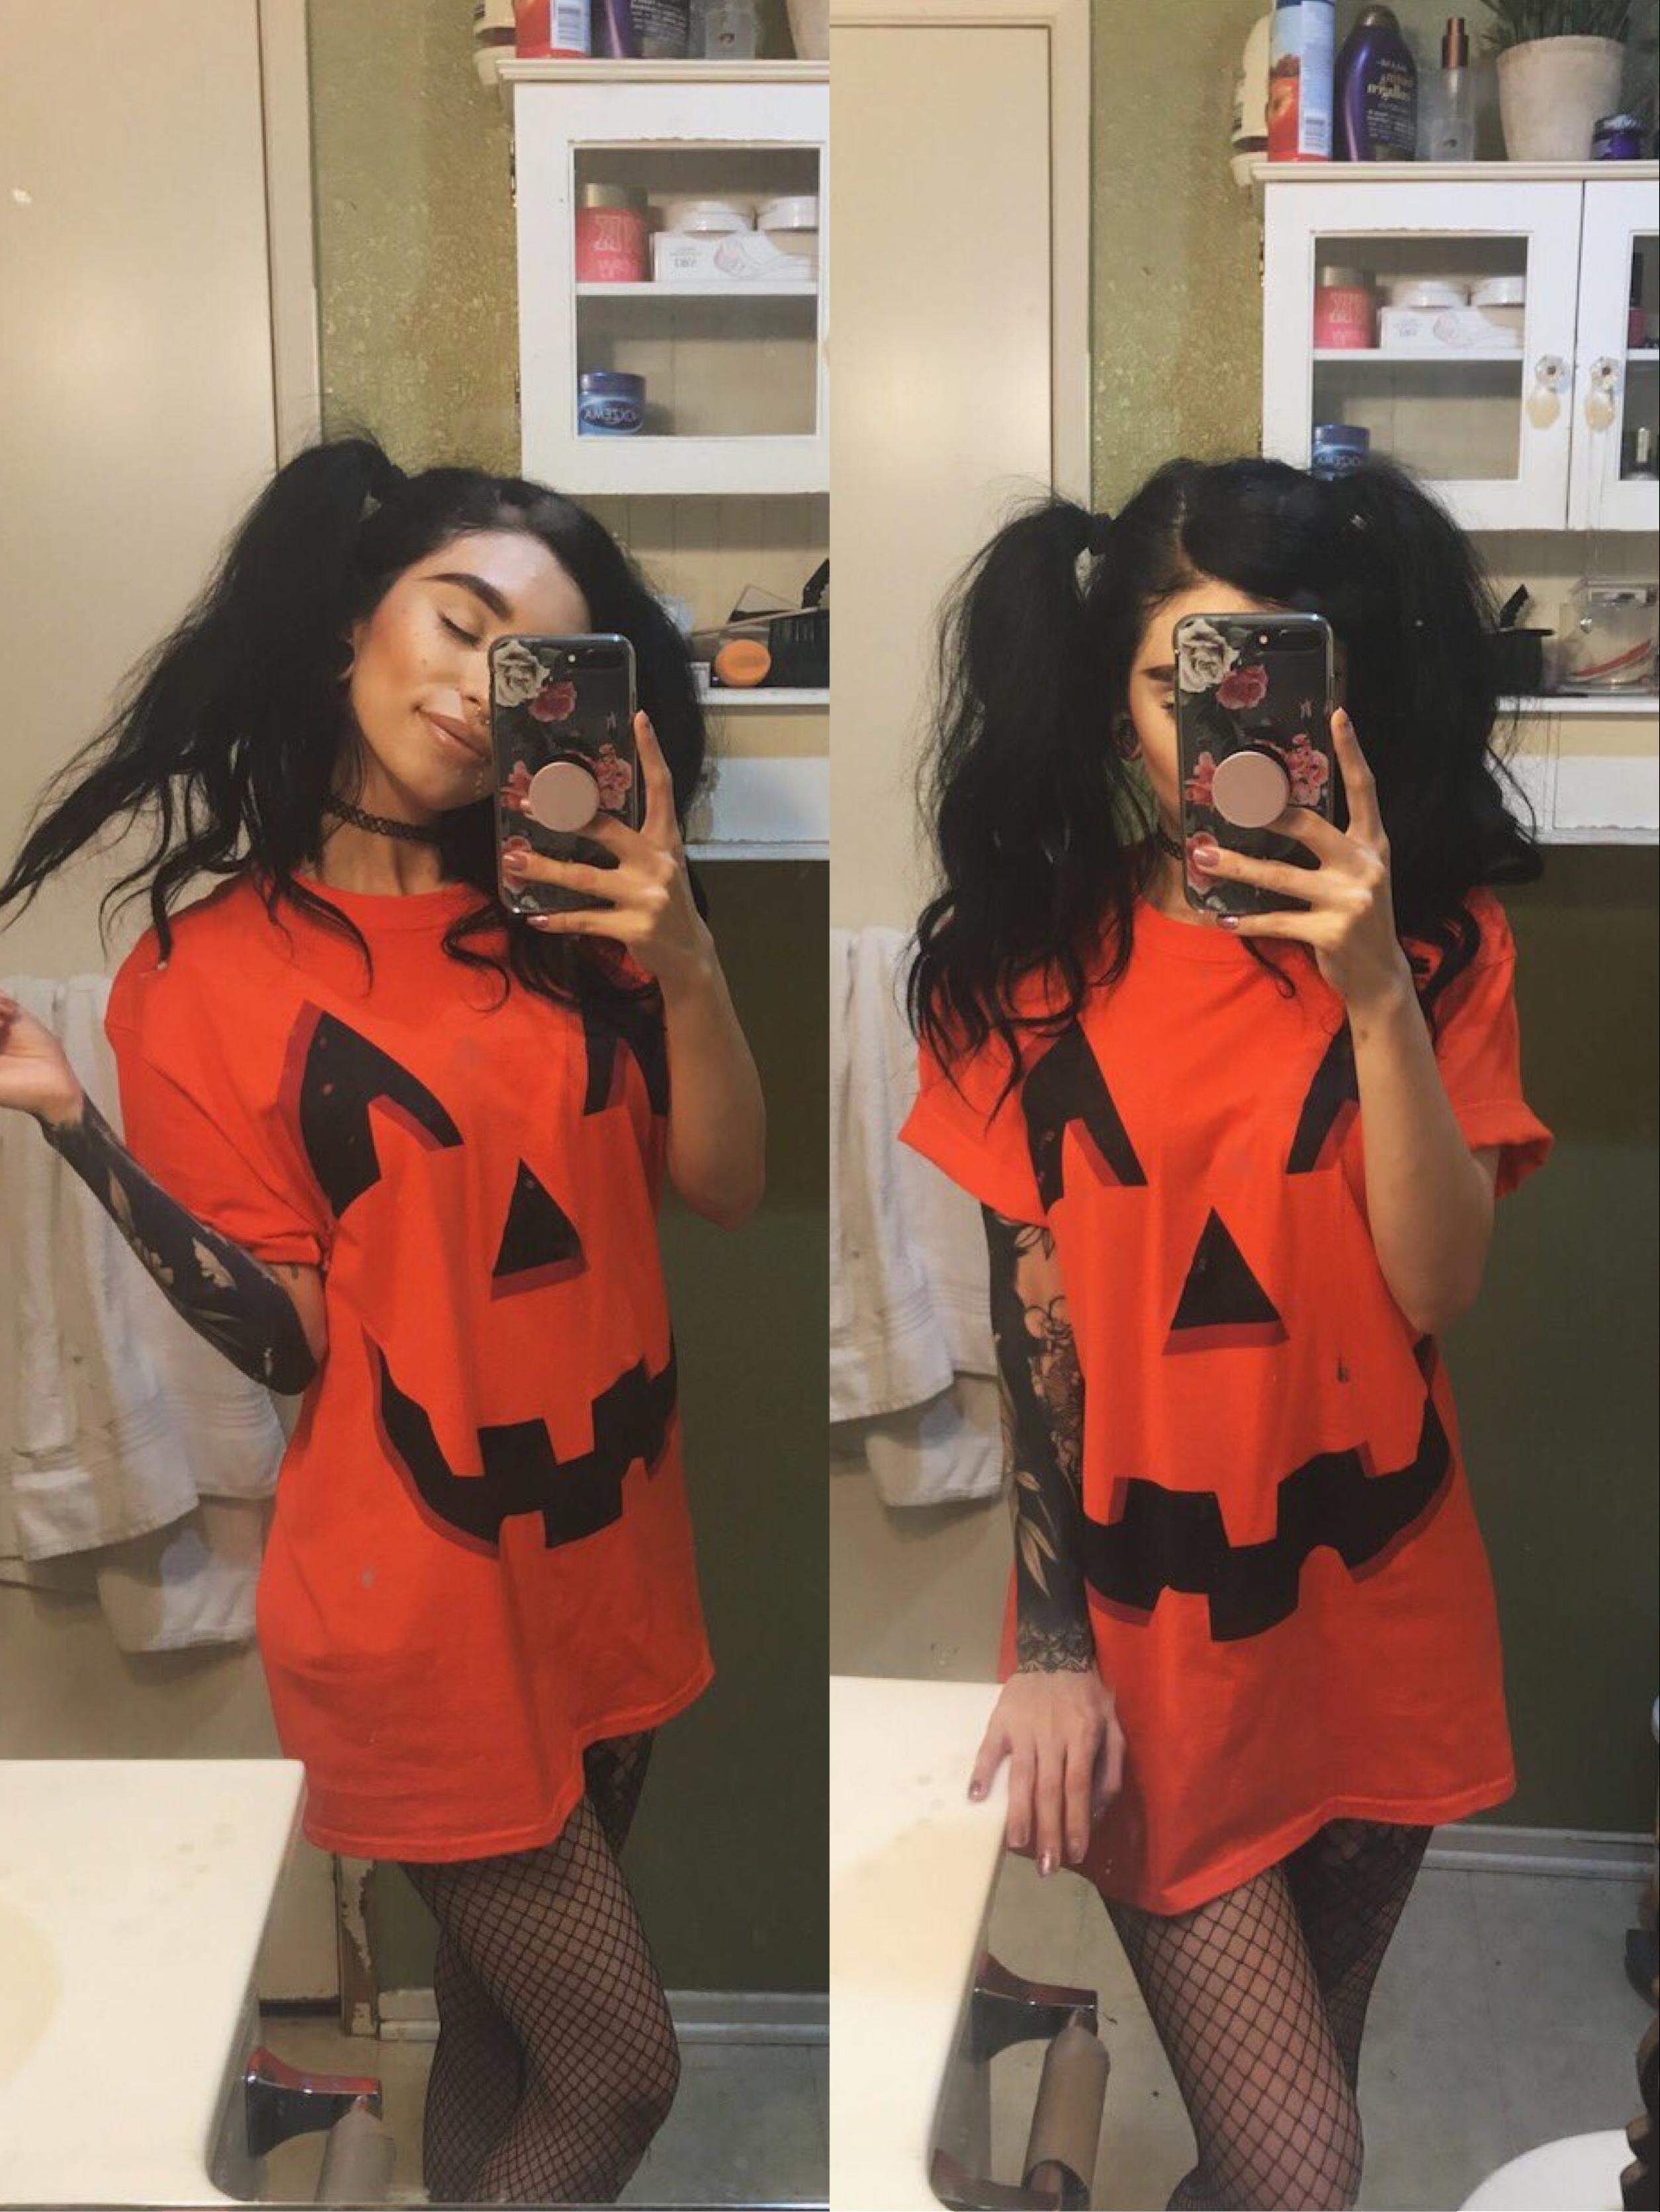 10 Attractive Halloween Ideas For 3 People e29ca8pinterest etherealgypseae29ca8 halloween e29ca9e280a2 pinterest costumes 2021